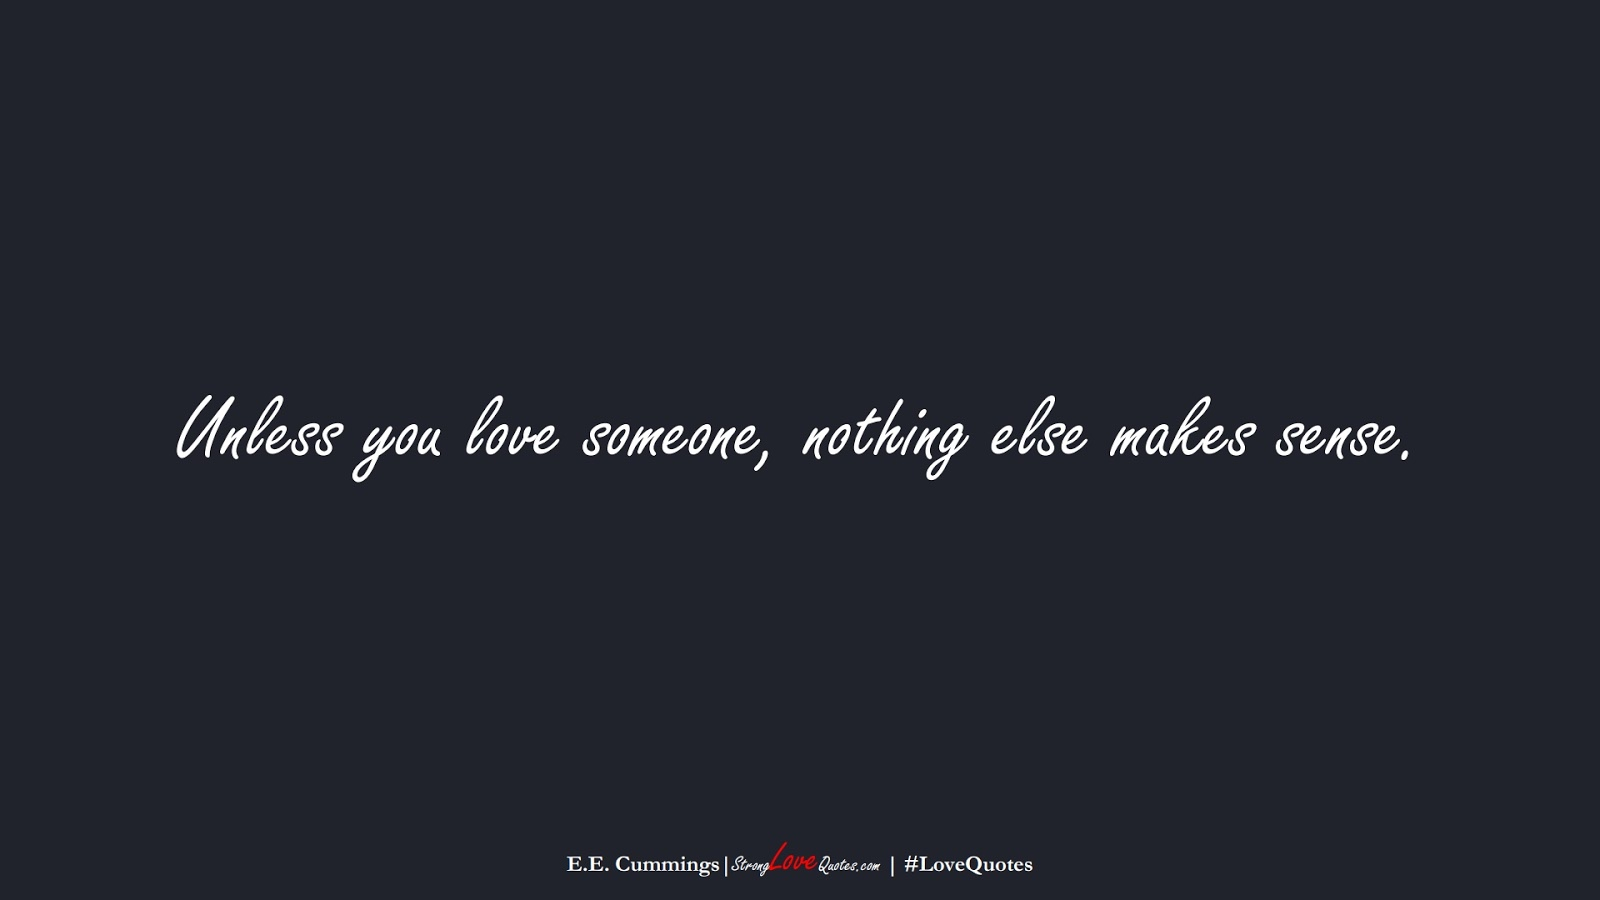 Unless you love someone, nothing else makes sense. (E.E. Cummings);  #LoveQuotes